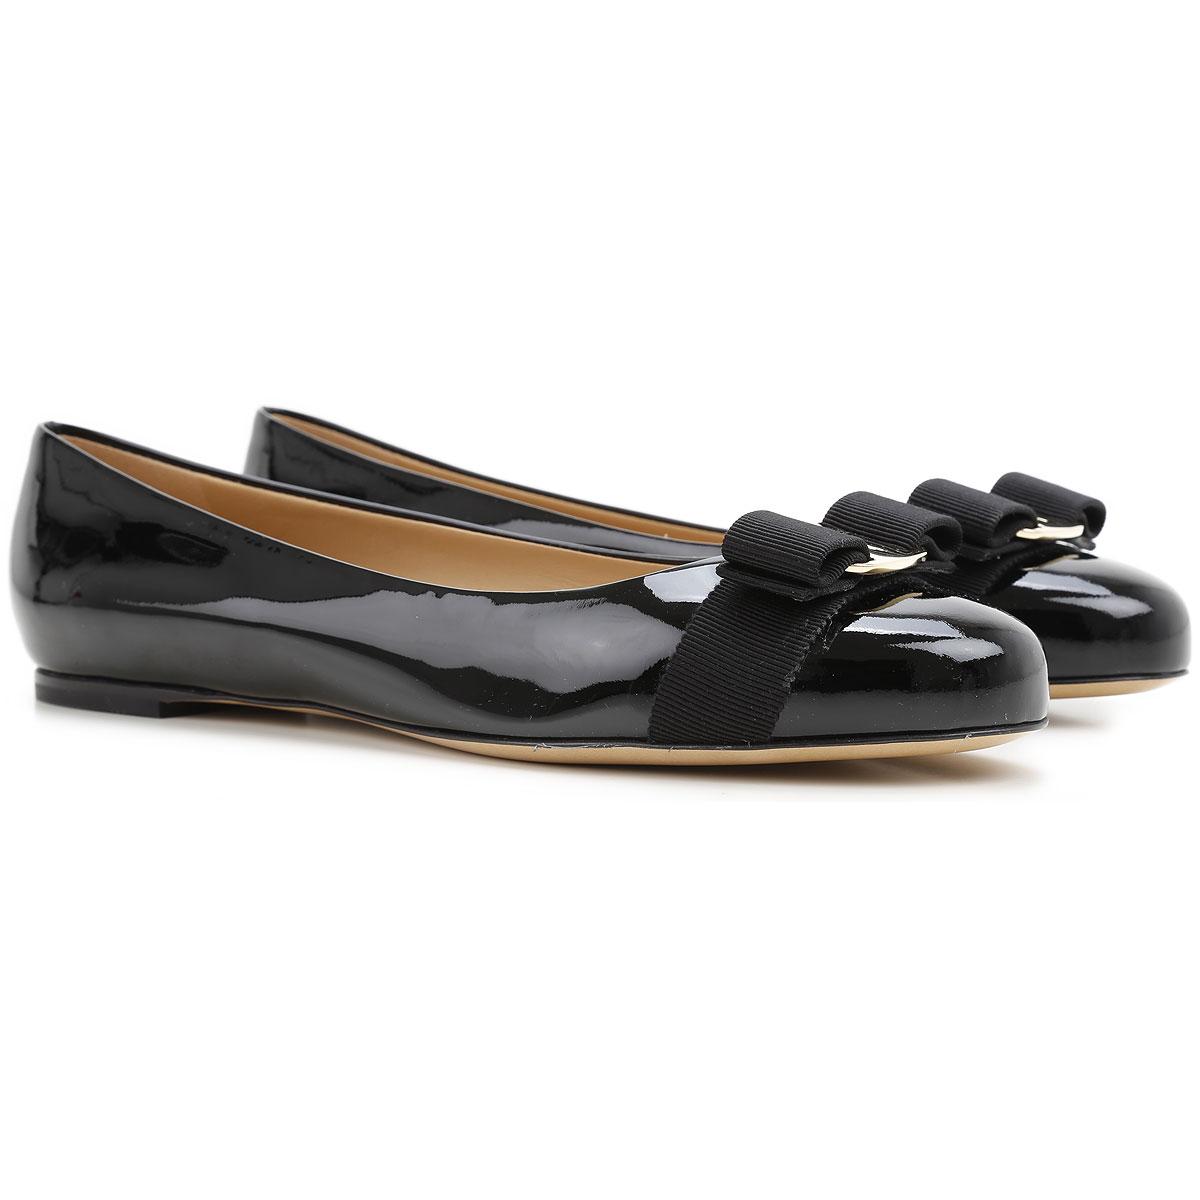 Womens Shoes Salvatore Ferragamo Style code 574556varinanero 351448